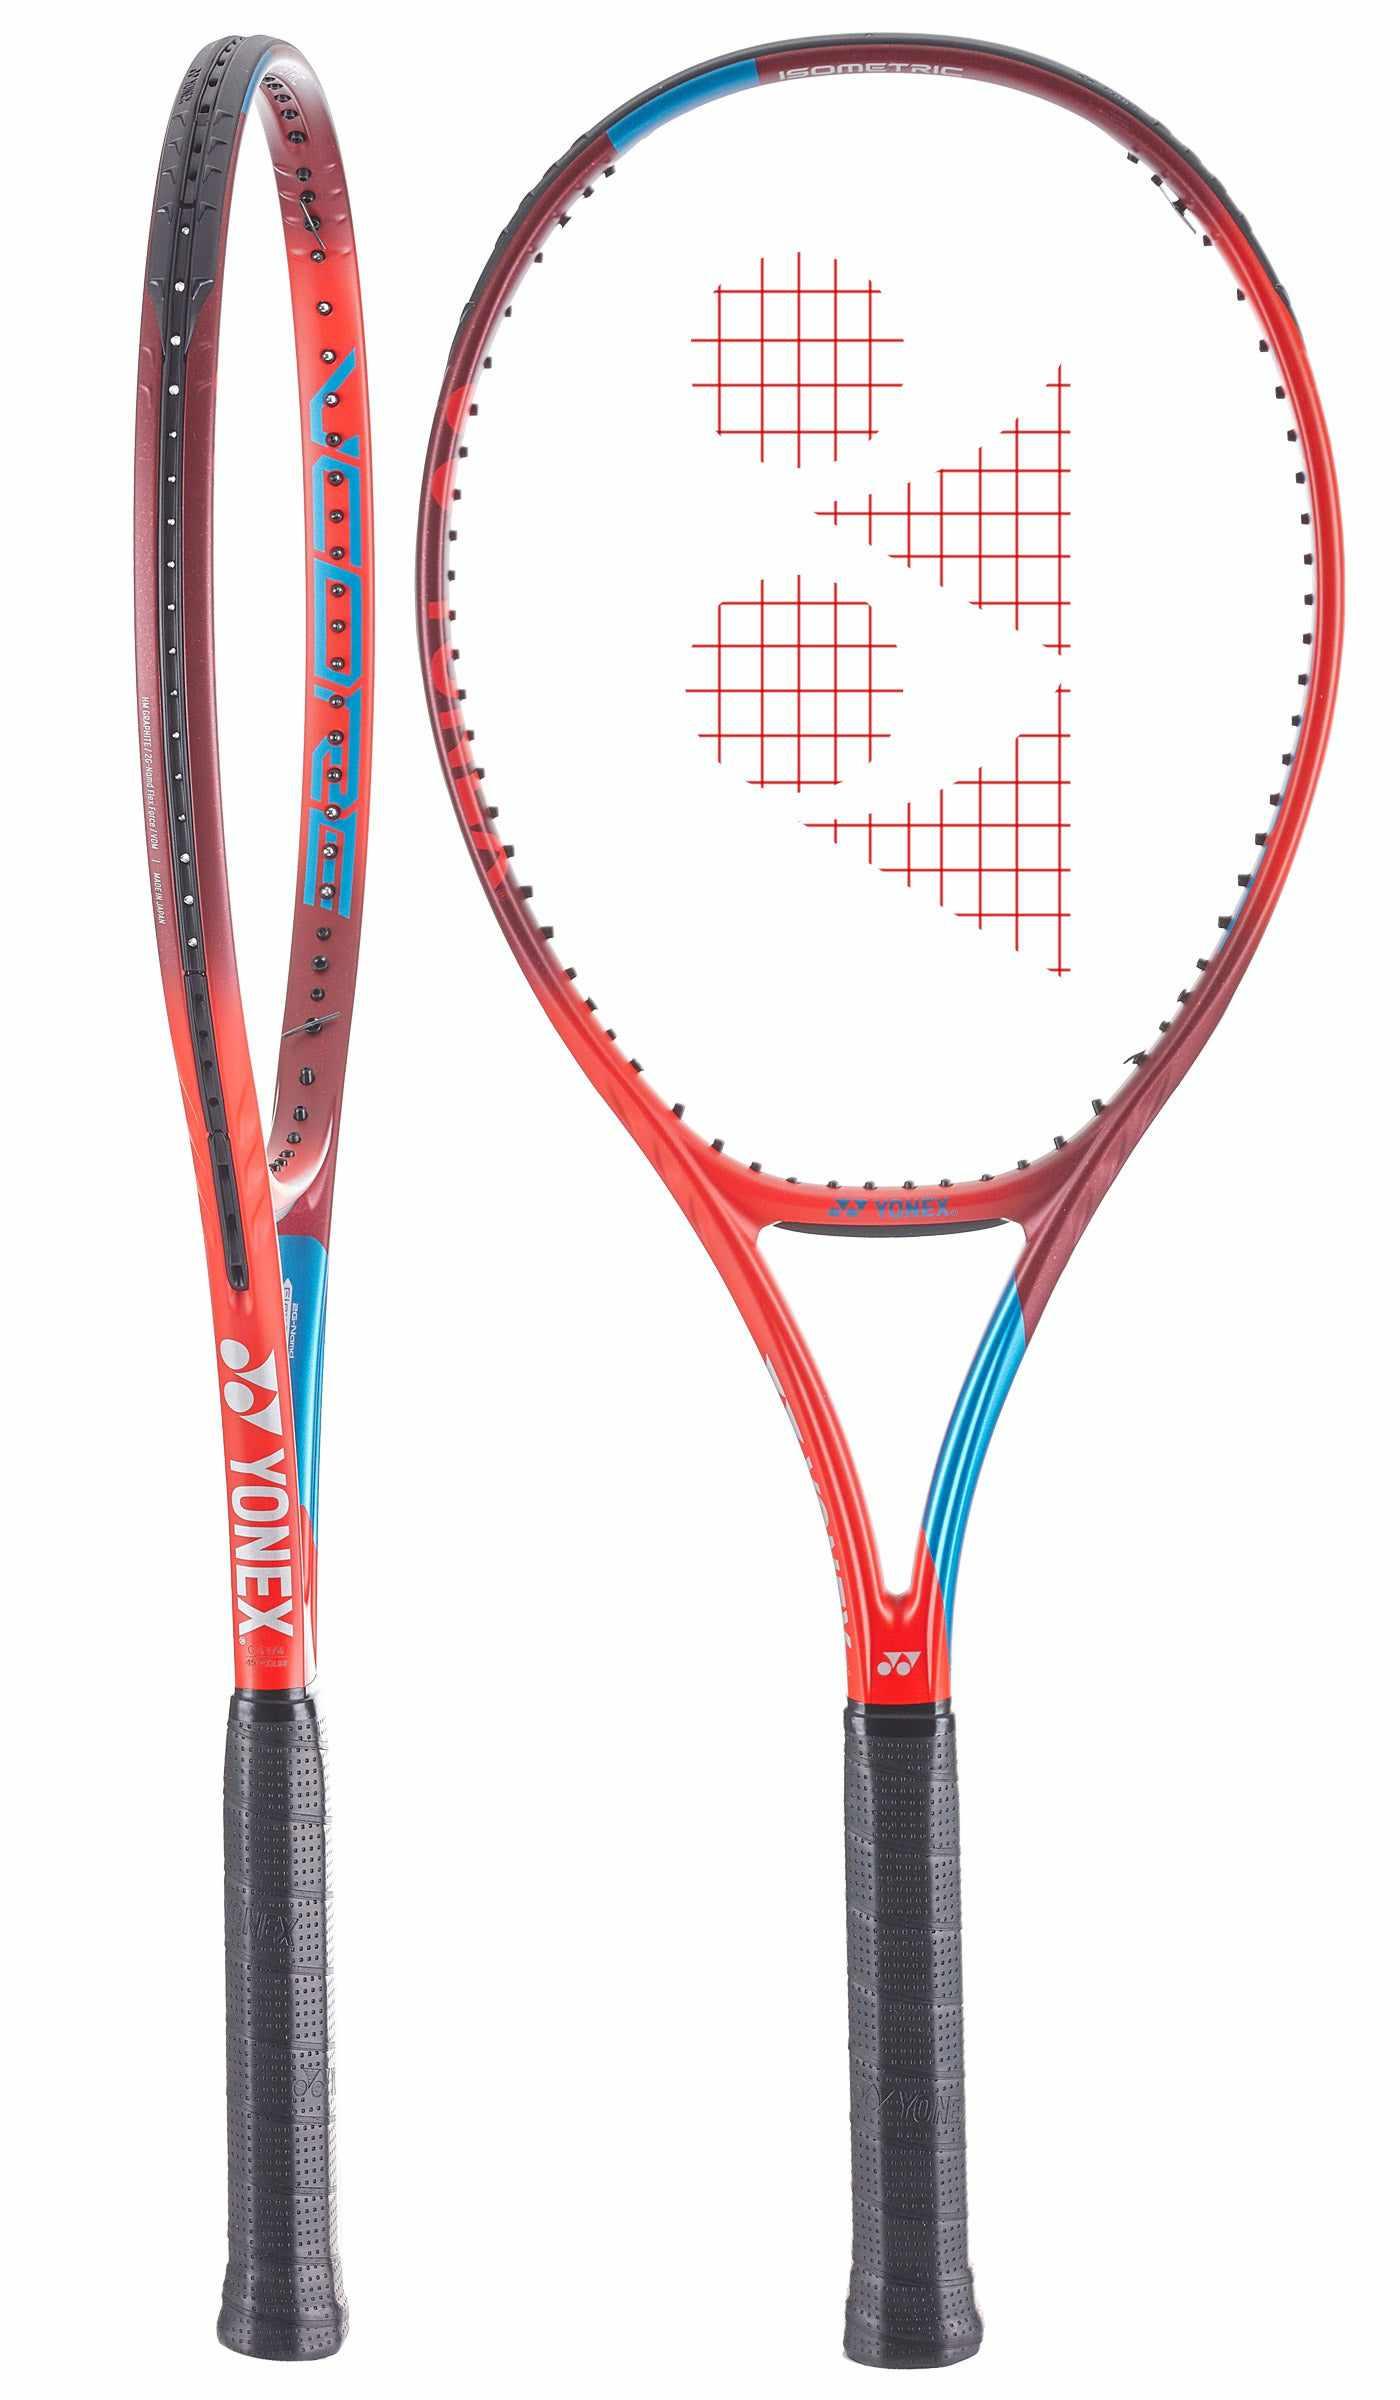 Yonex VCORE 95 6th Gen Tennis Racquet